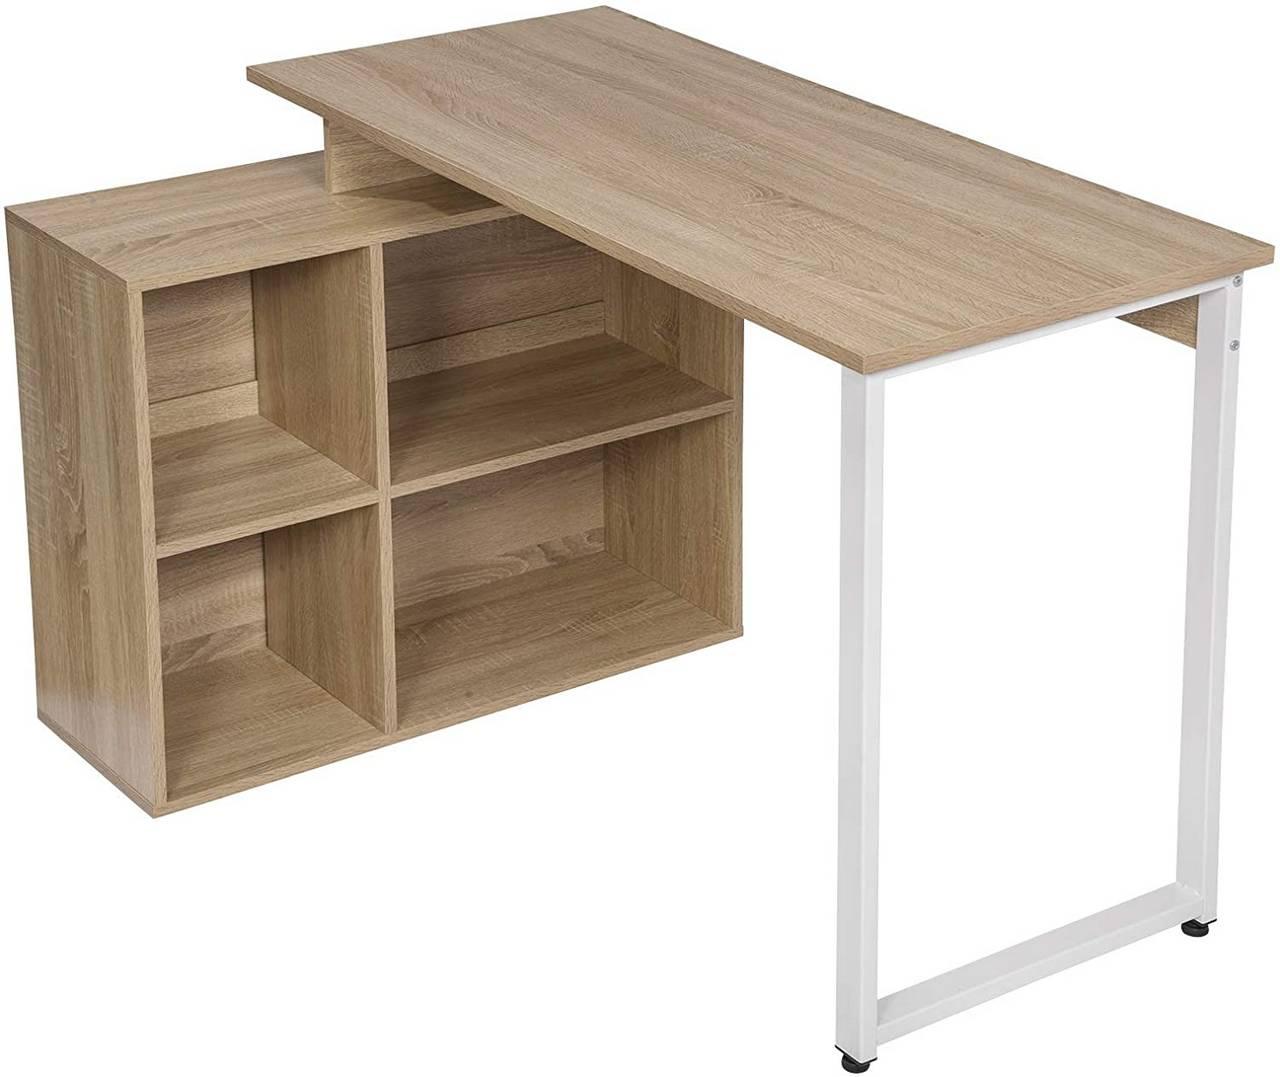 - Desk With Wooden Shelves - Model Jessy Woltu.eu